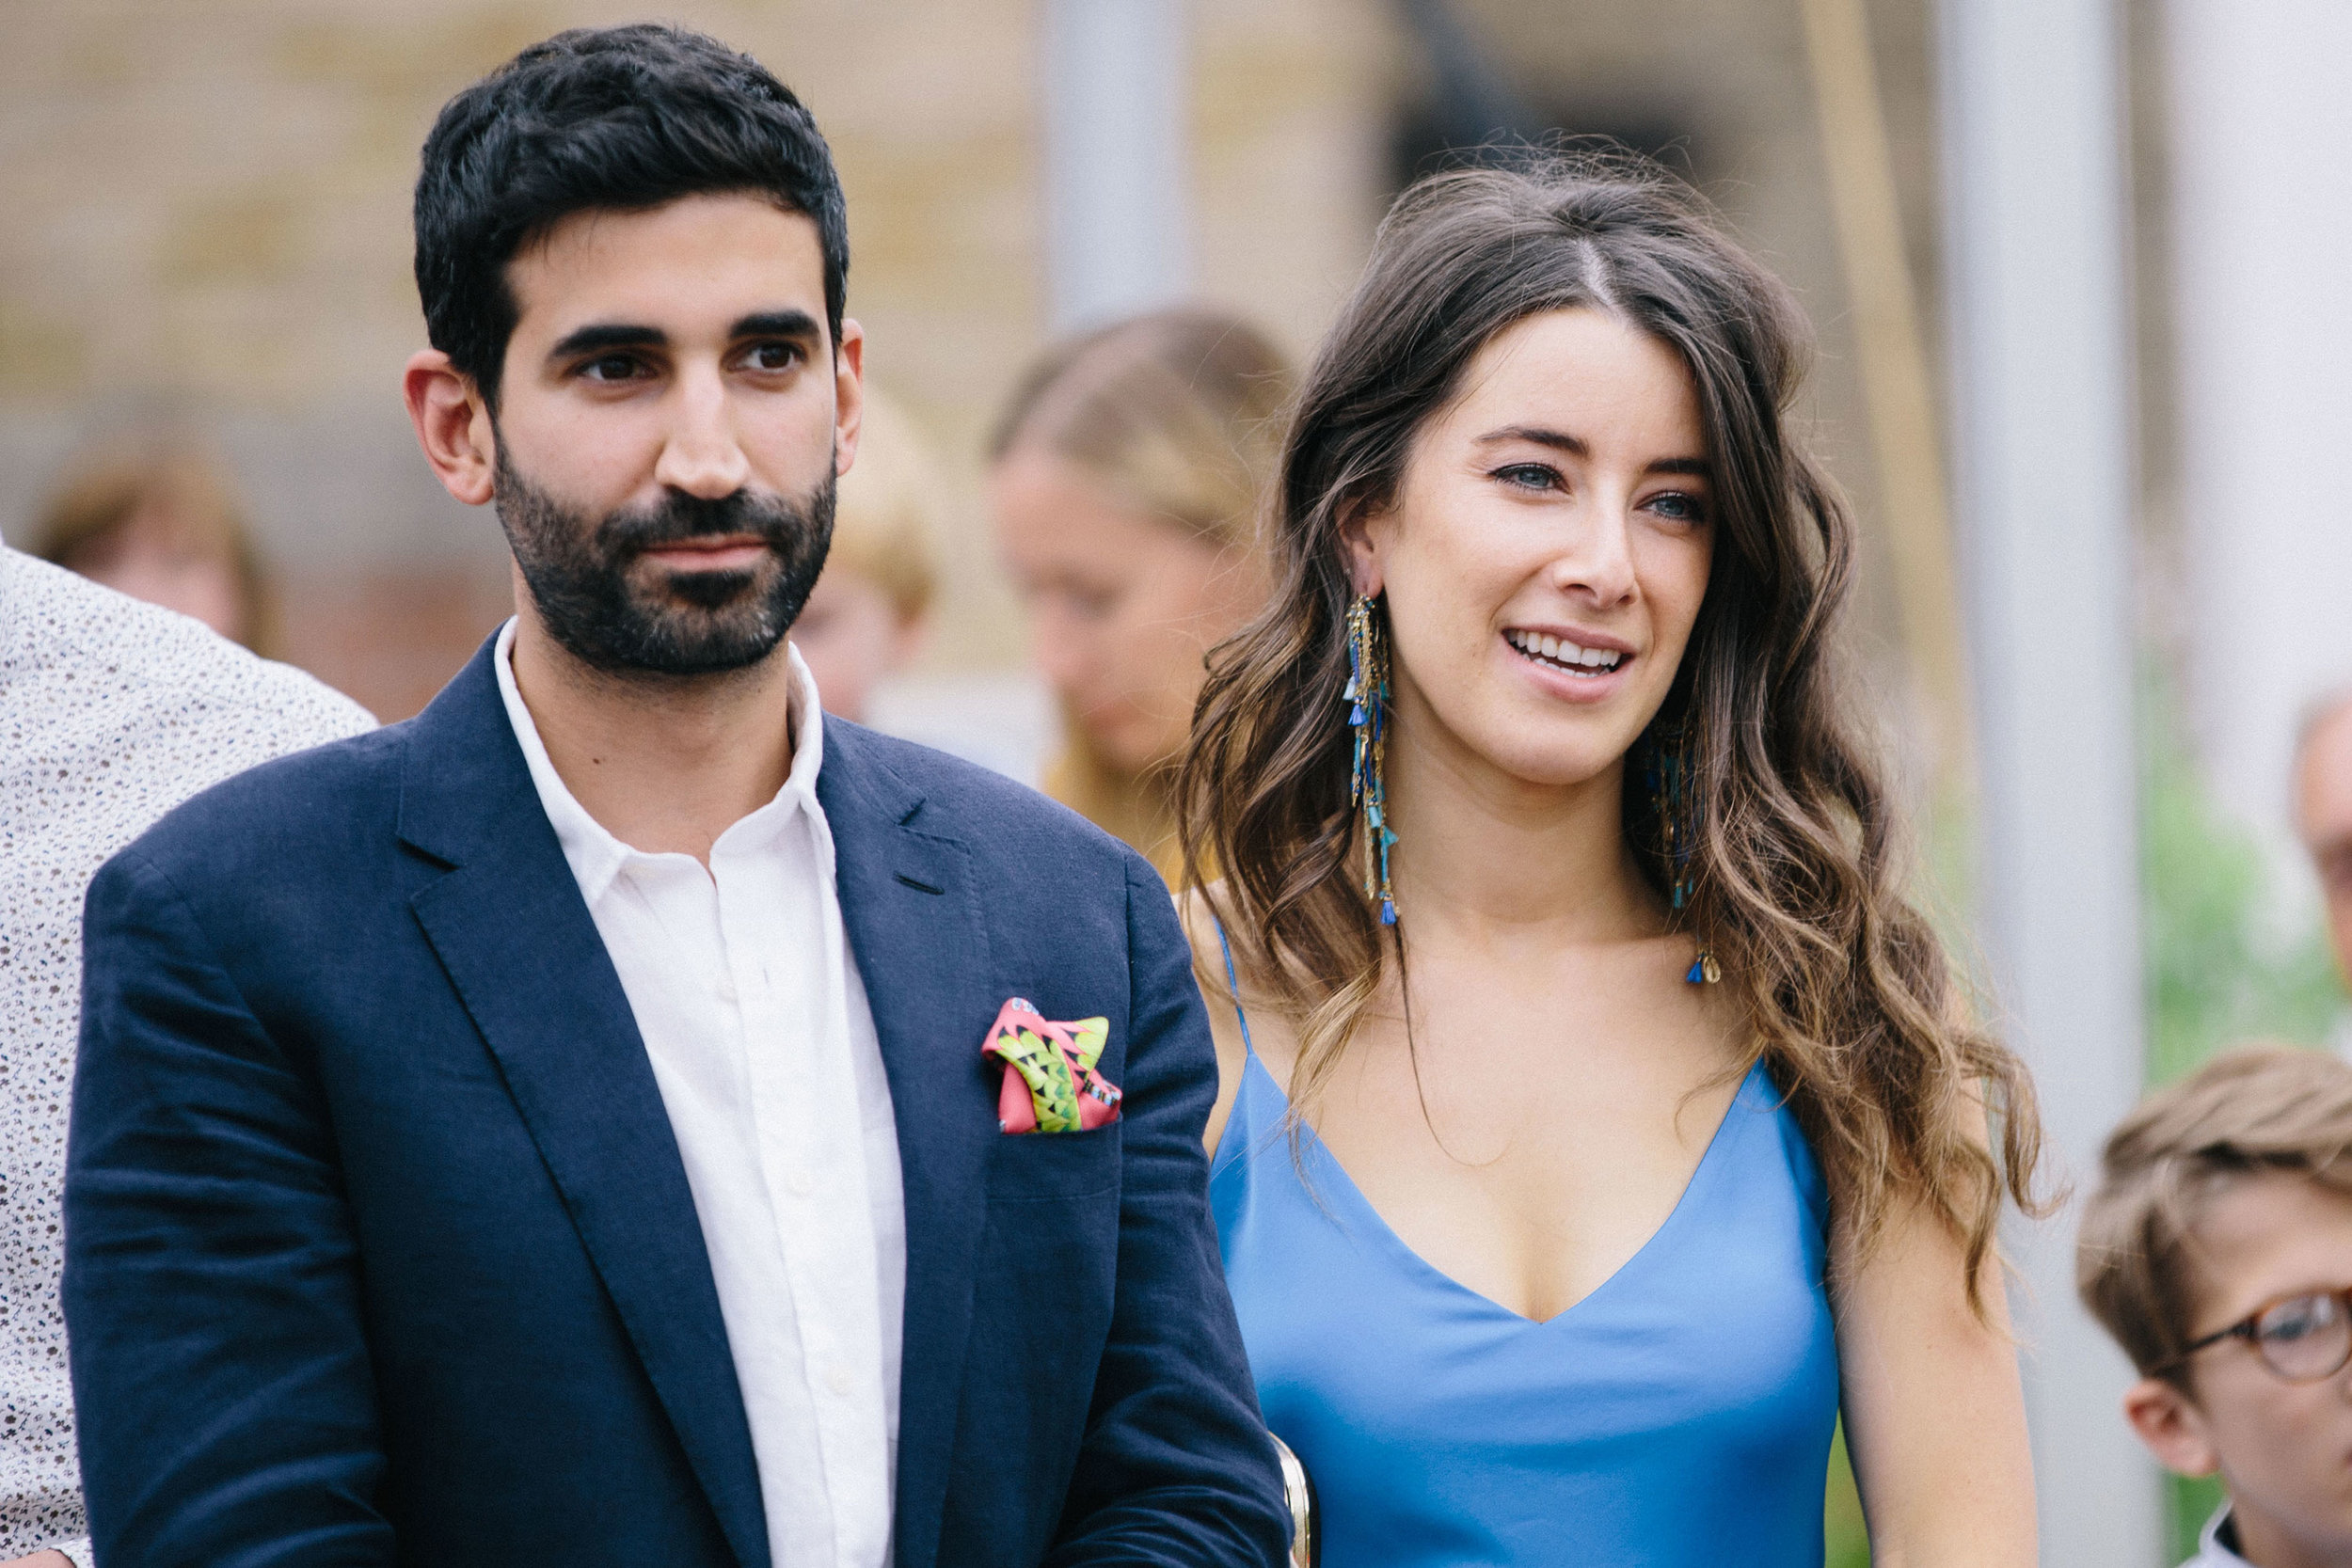 West-London-wedding-party-in-Ladbroke-Grove-Michael-Newington-Gray-38.jpg